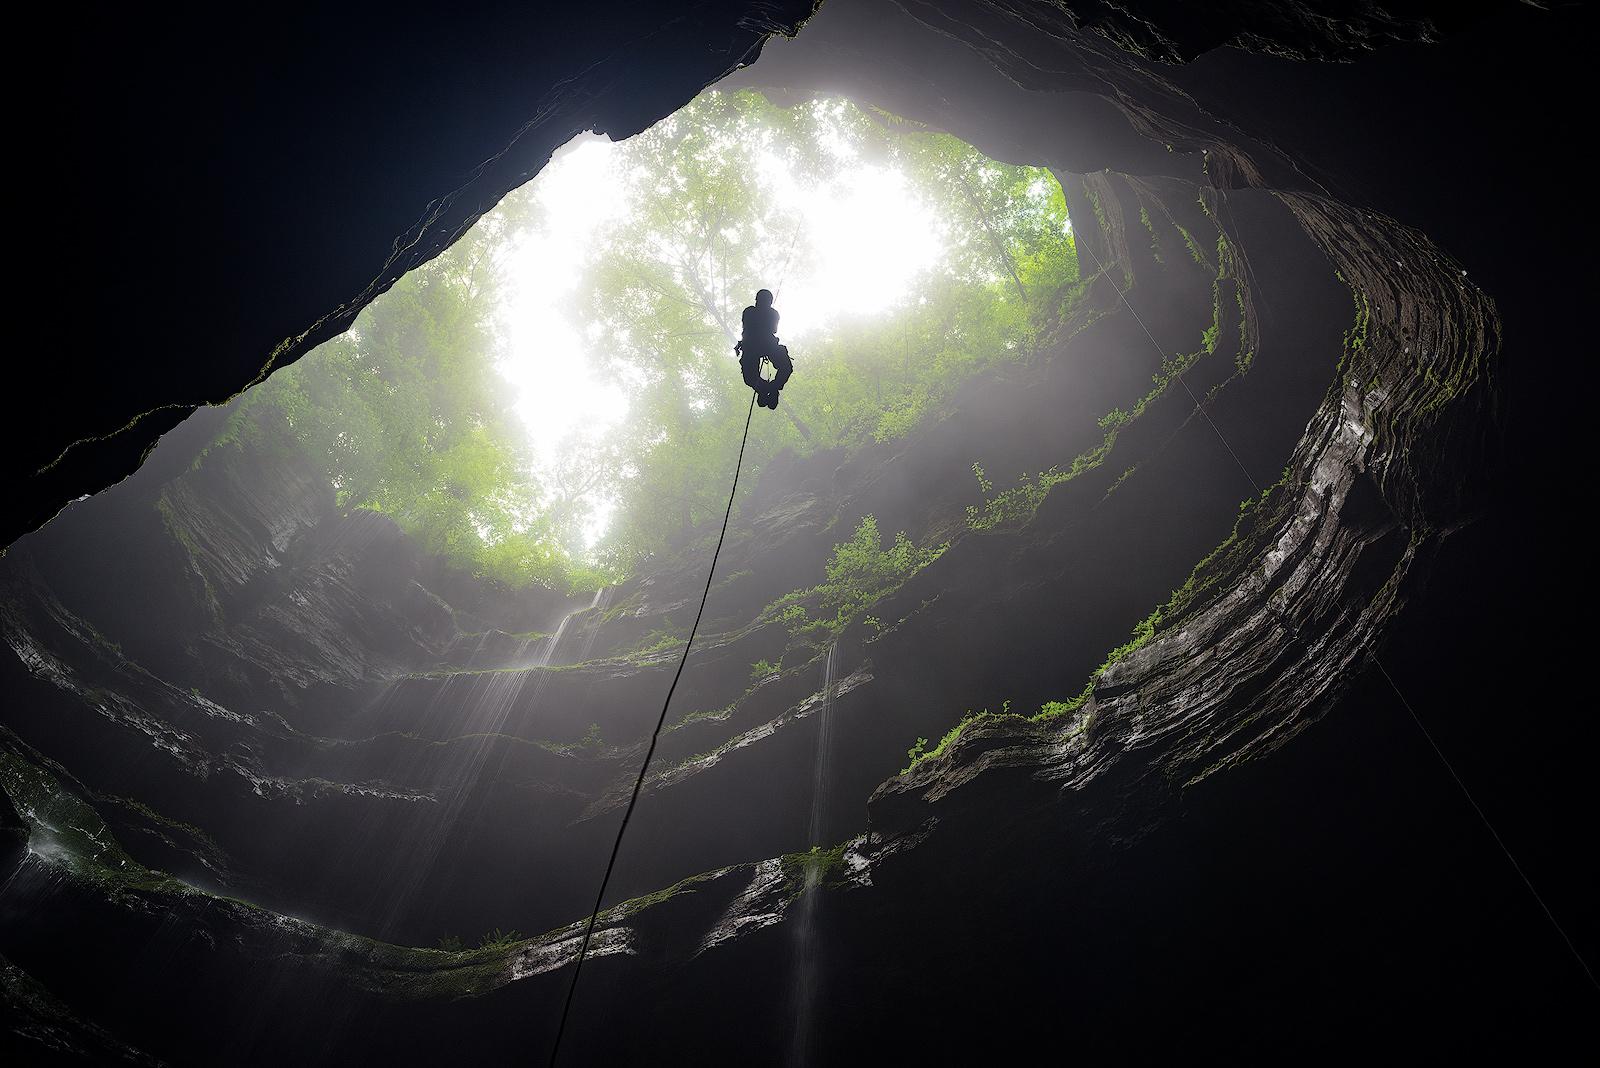 Neversink, Neversink Cave Preserve, Alabama, jackson county, waterfall, pit, fens, moss, southeastern cave conservancy, limestone...